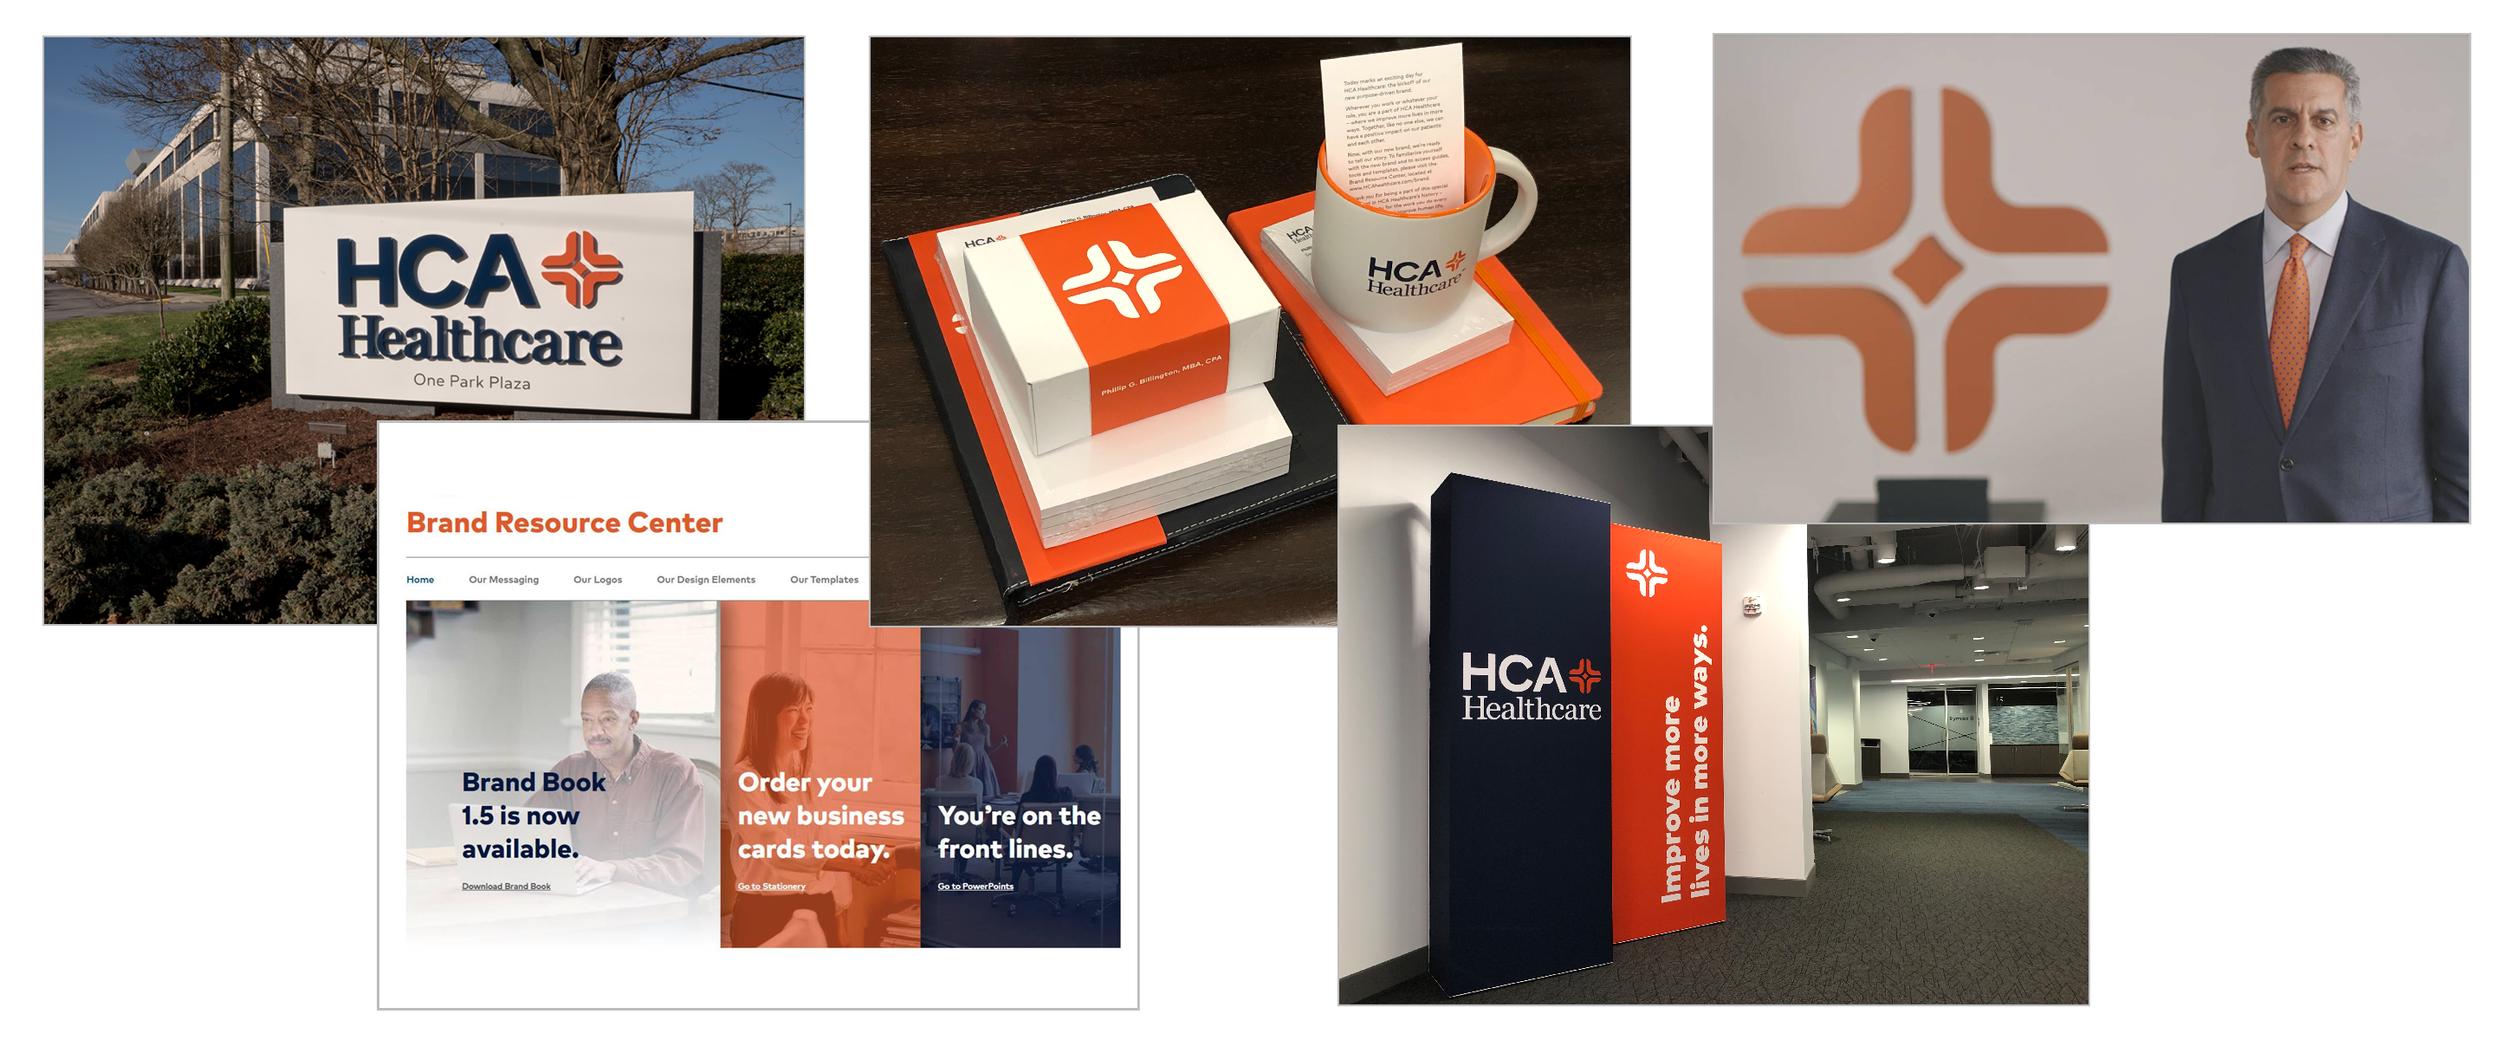 HCA_BrandKickoff_1.png